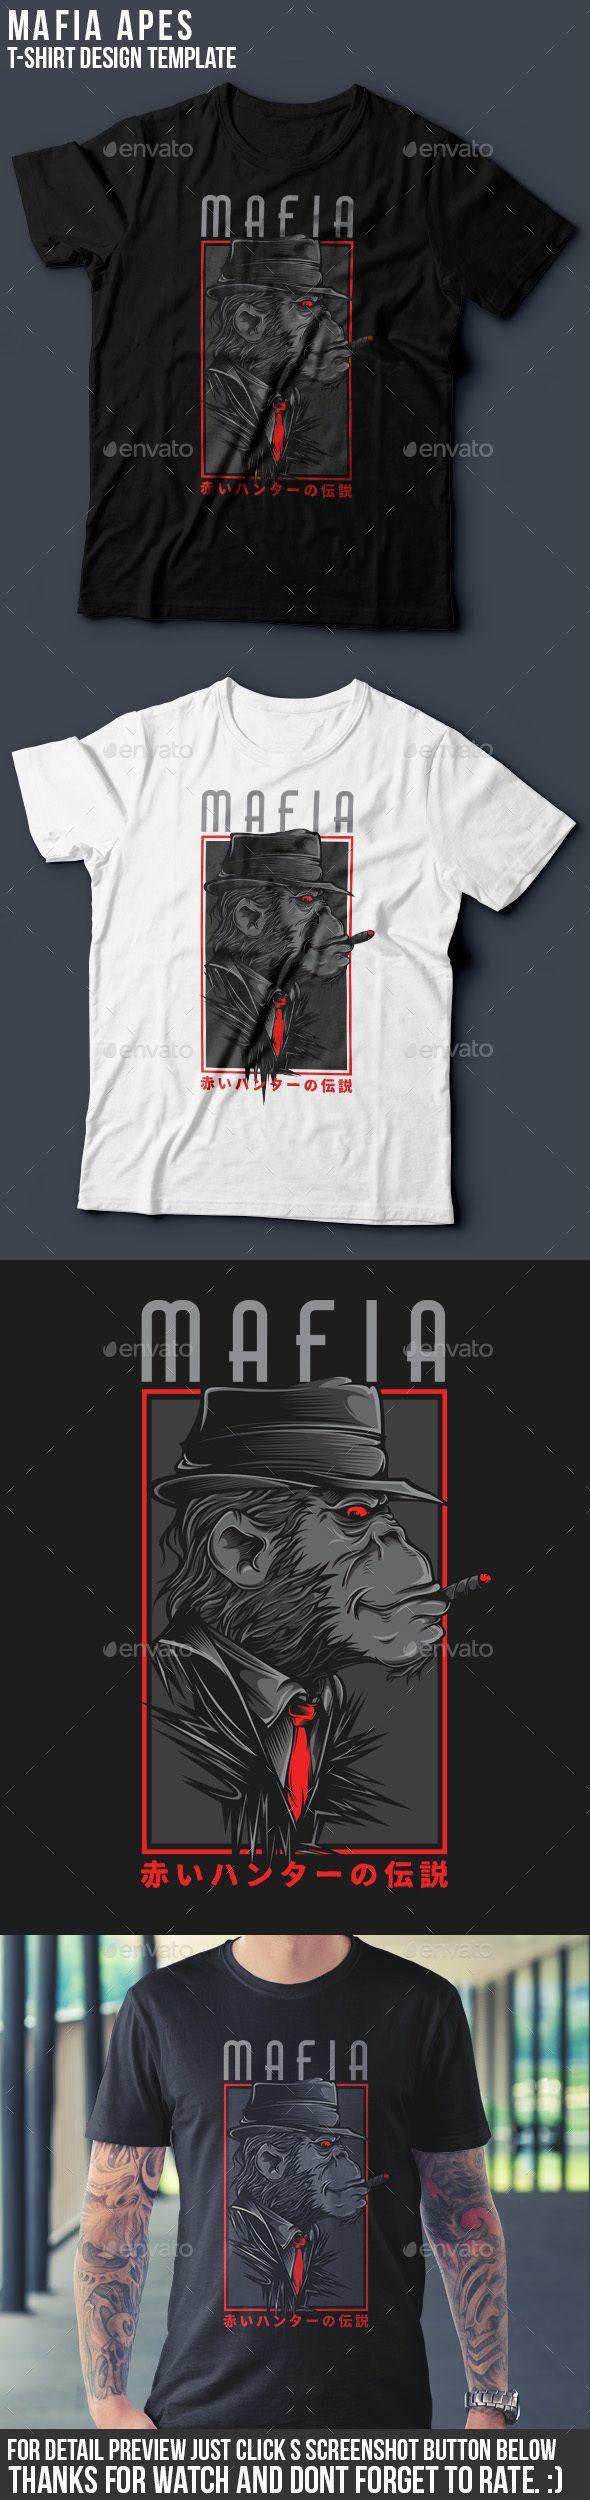 Mafia 2 TShirt Design — Vector EPS #apes #cloth • Available here → https://graphicriver.net/item/mafia-2-tshirt-design/12702897?ref=pxcr